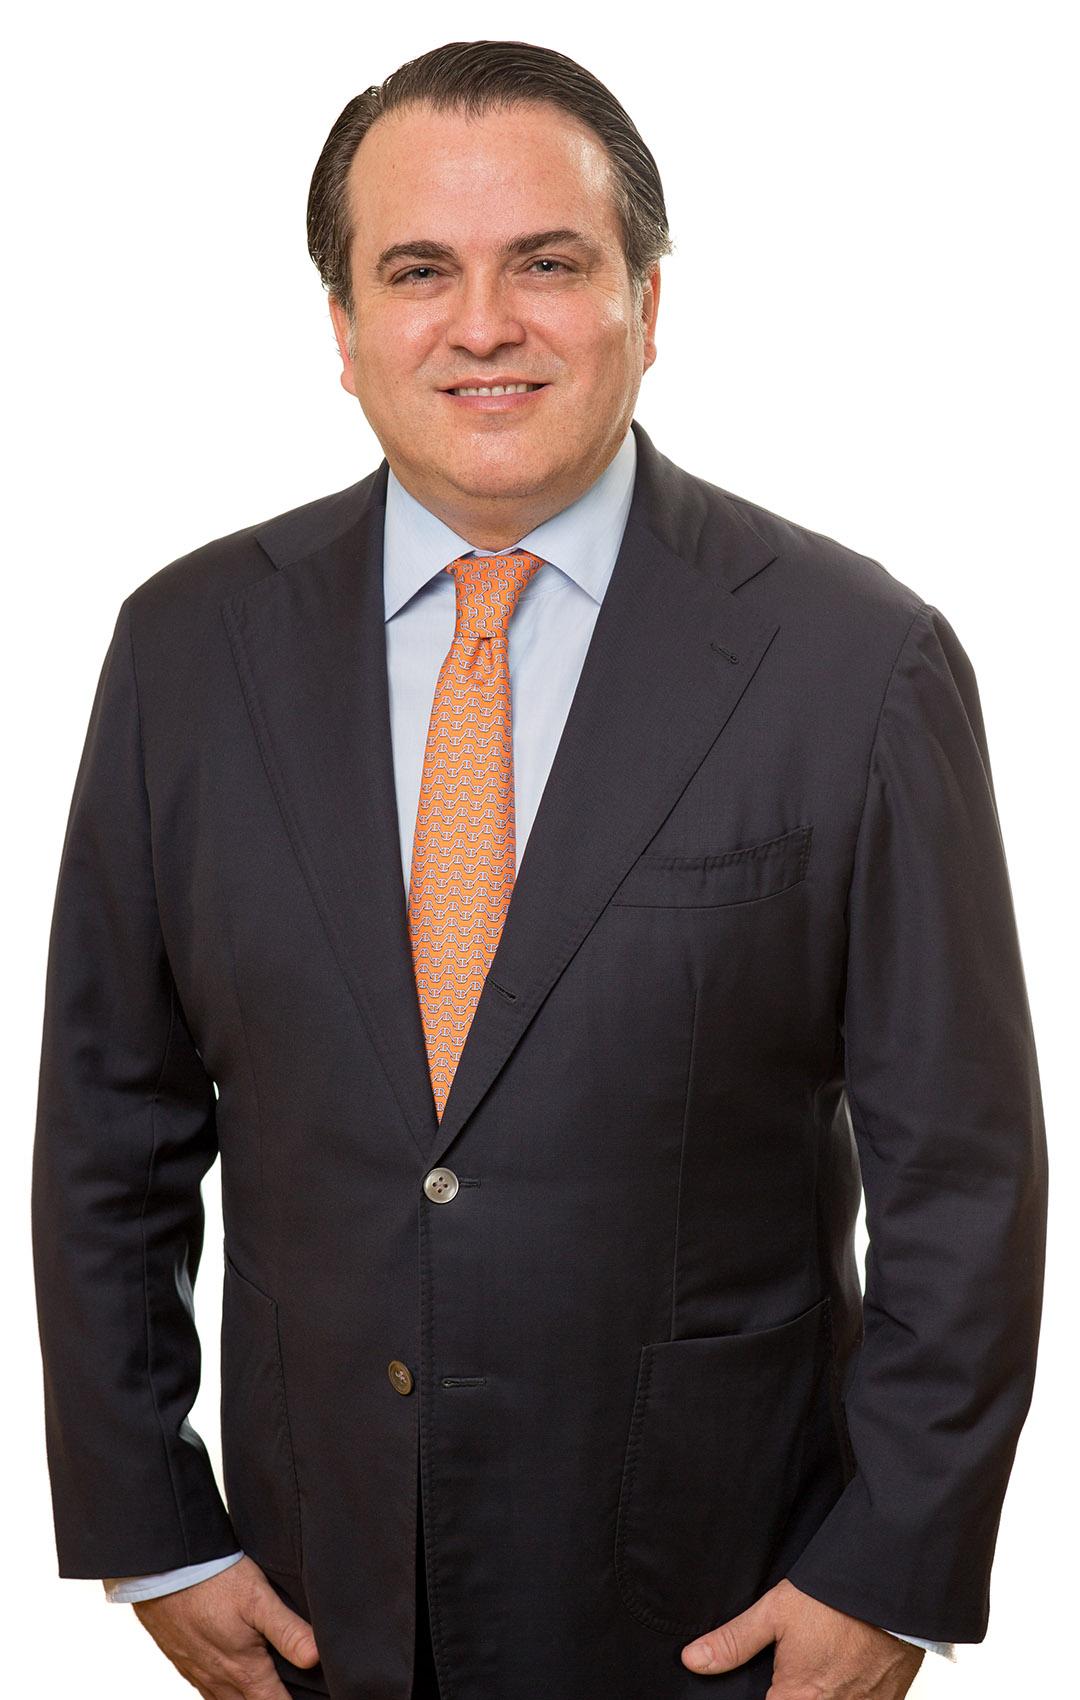 John F. Haley